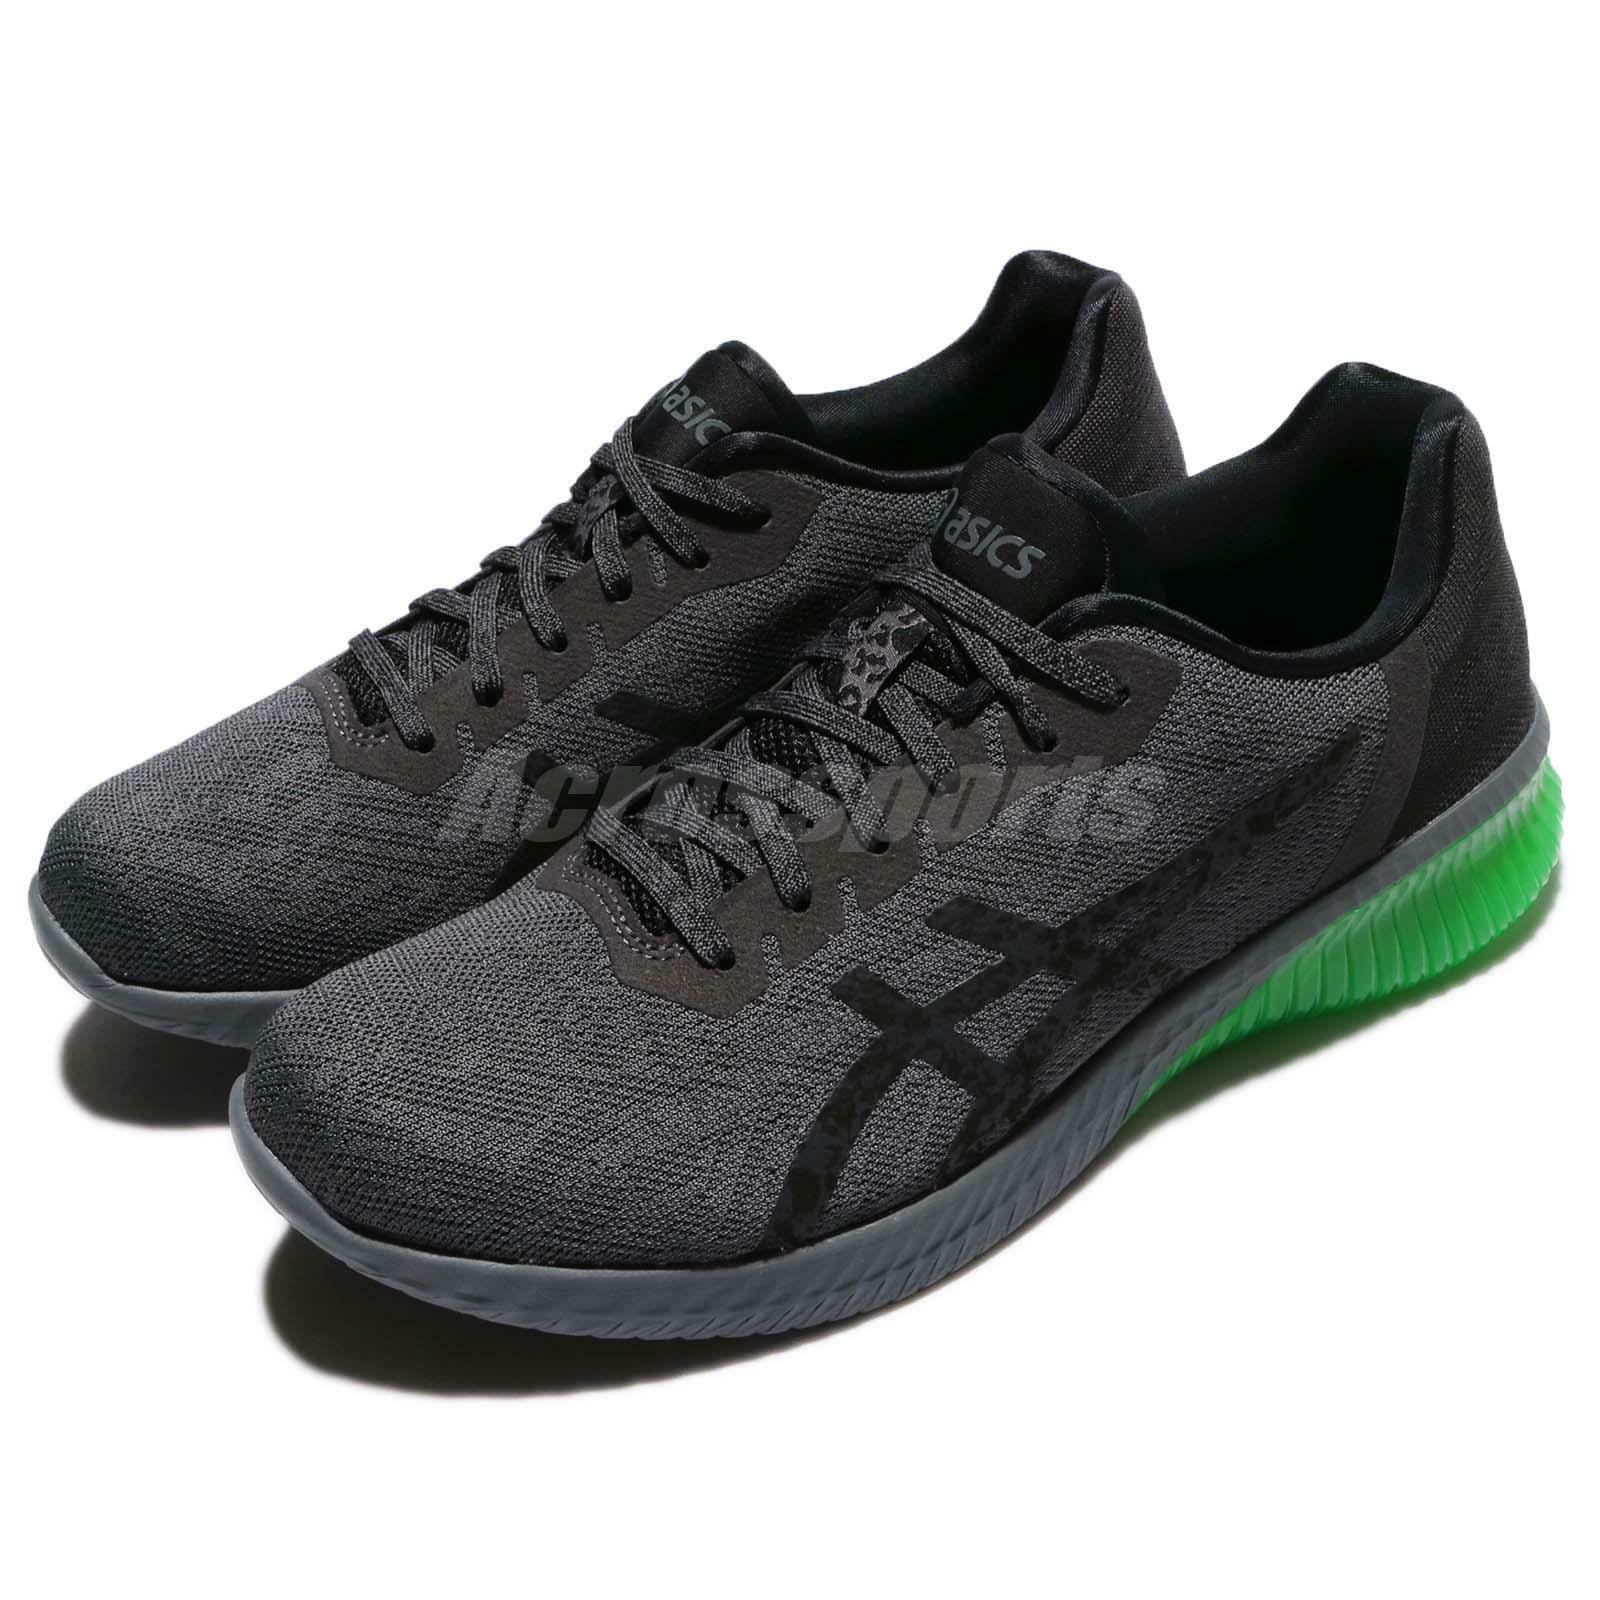 Asics Gel-Kenun Dark Dark Gris Vert Gecko Homme Running Chaussures Trainers  T7C4N-9590 6de777 6e33bbc7eaaf